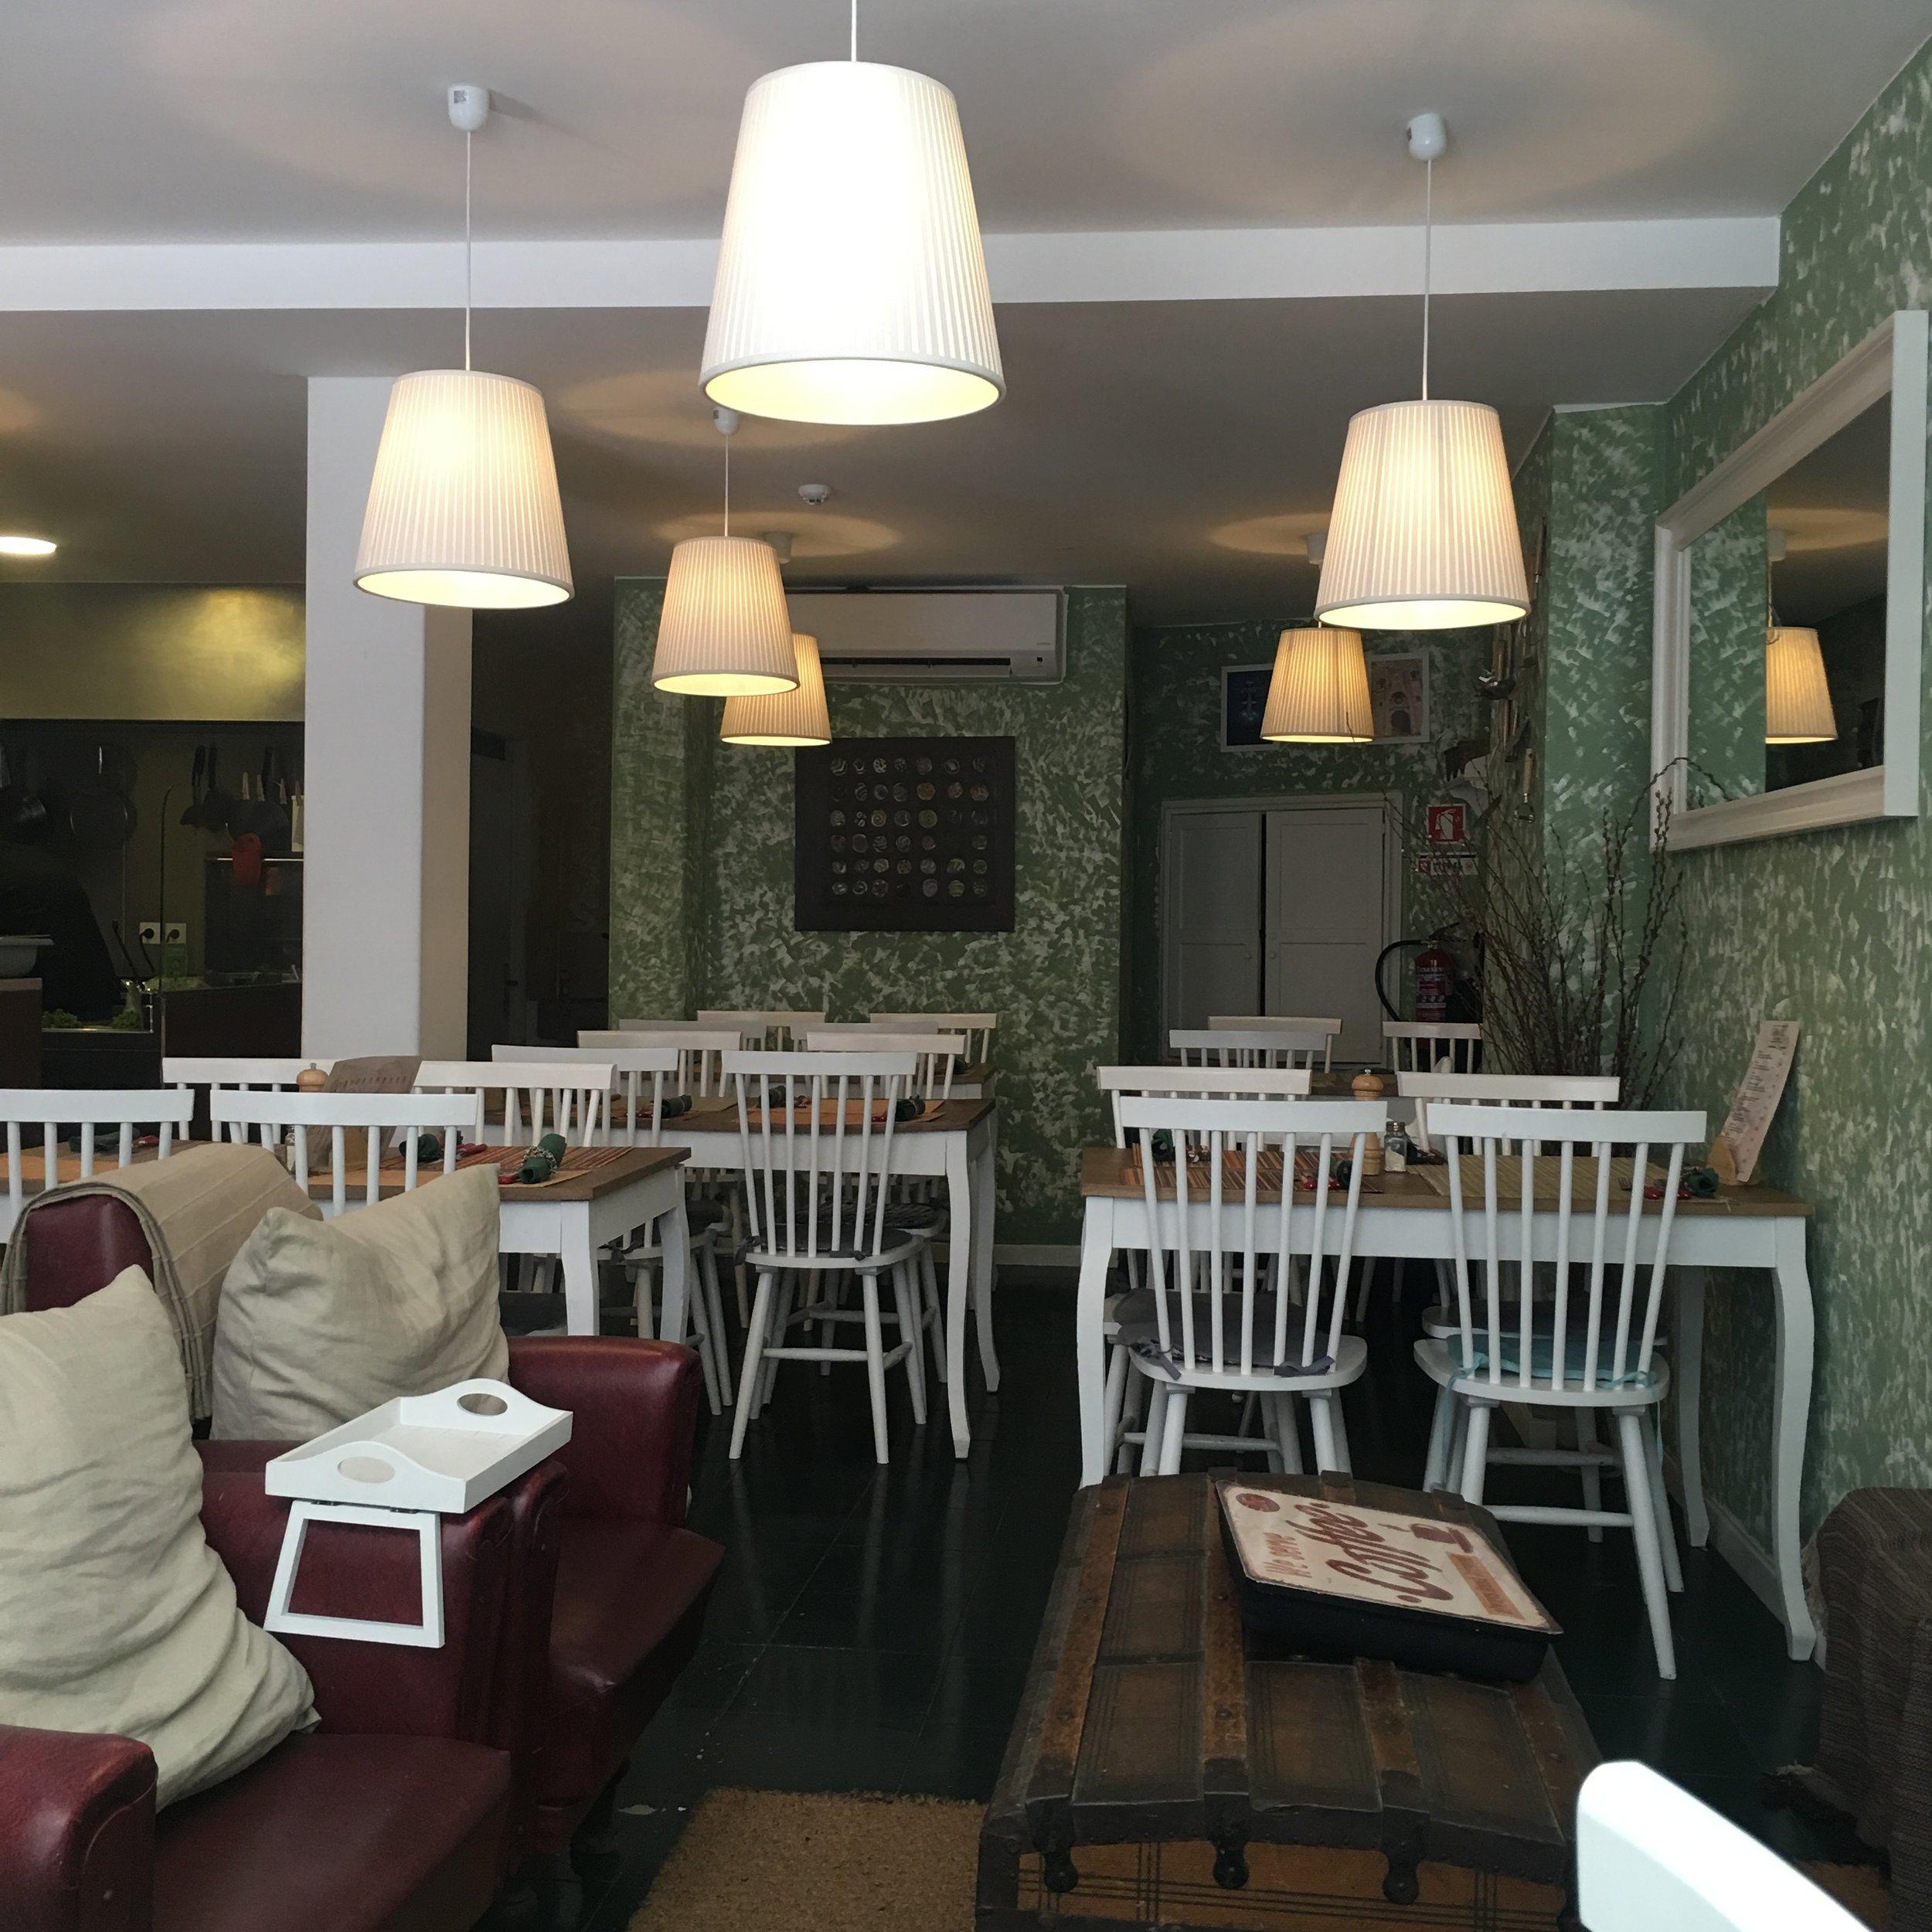 Casa Do mercado - organic restaurant - eco travel - florum fashion magazine - noelle lynne